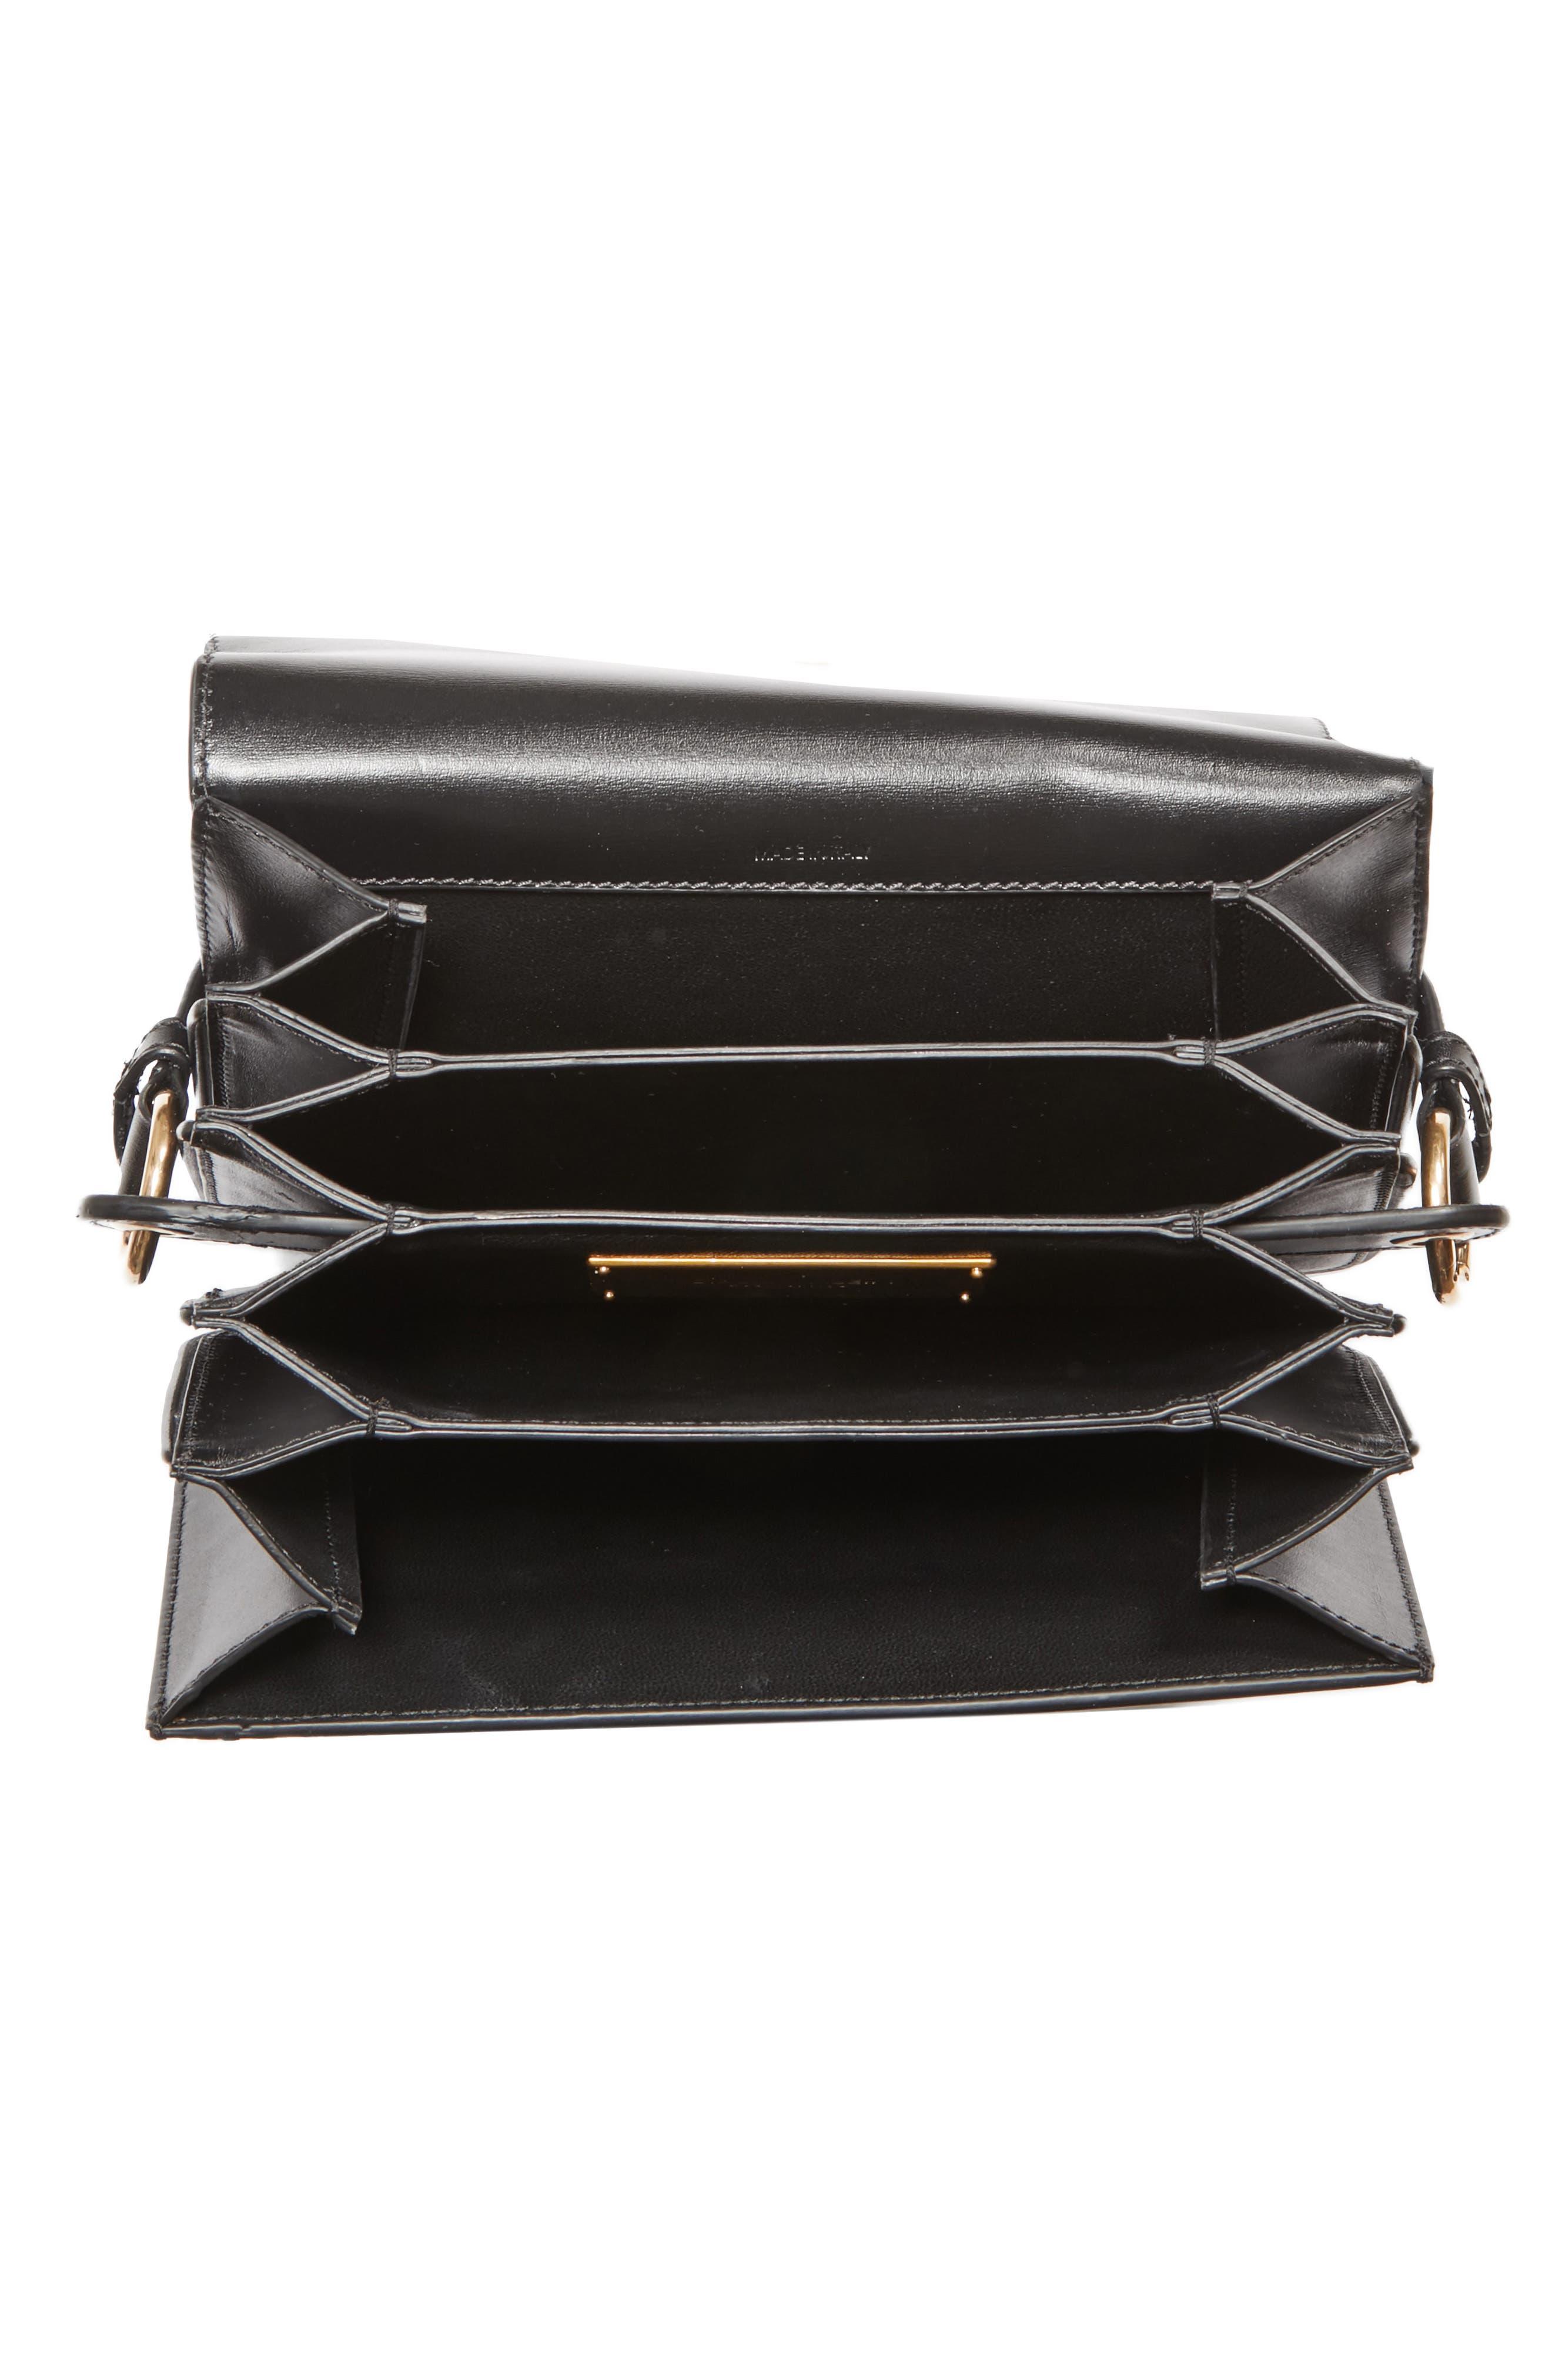 CALVIN KLEIN 209W39NYC Small Round Lock Shoulder Bag,                             Alternate thumbnail 4, color,                             BLACK